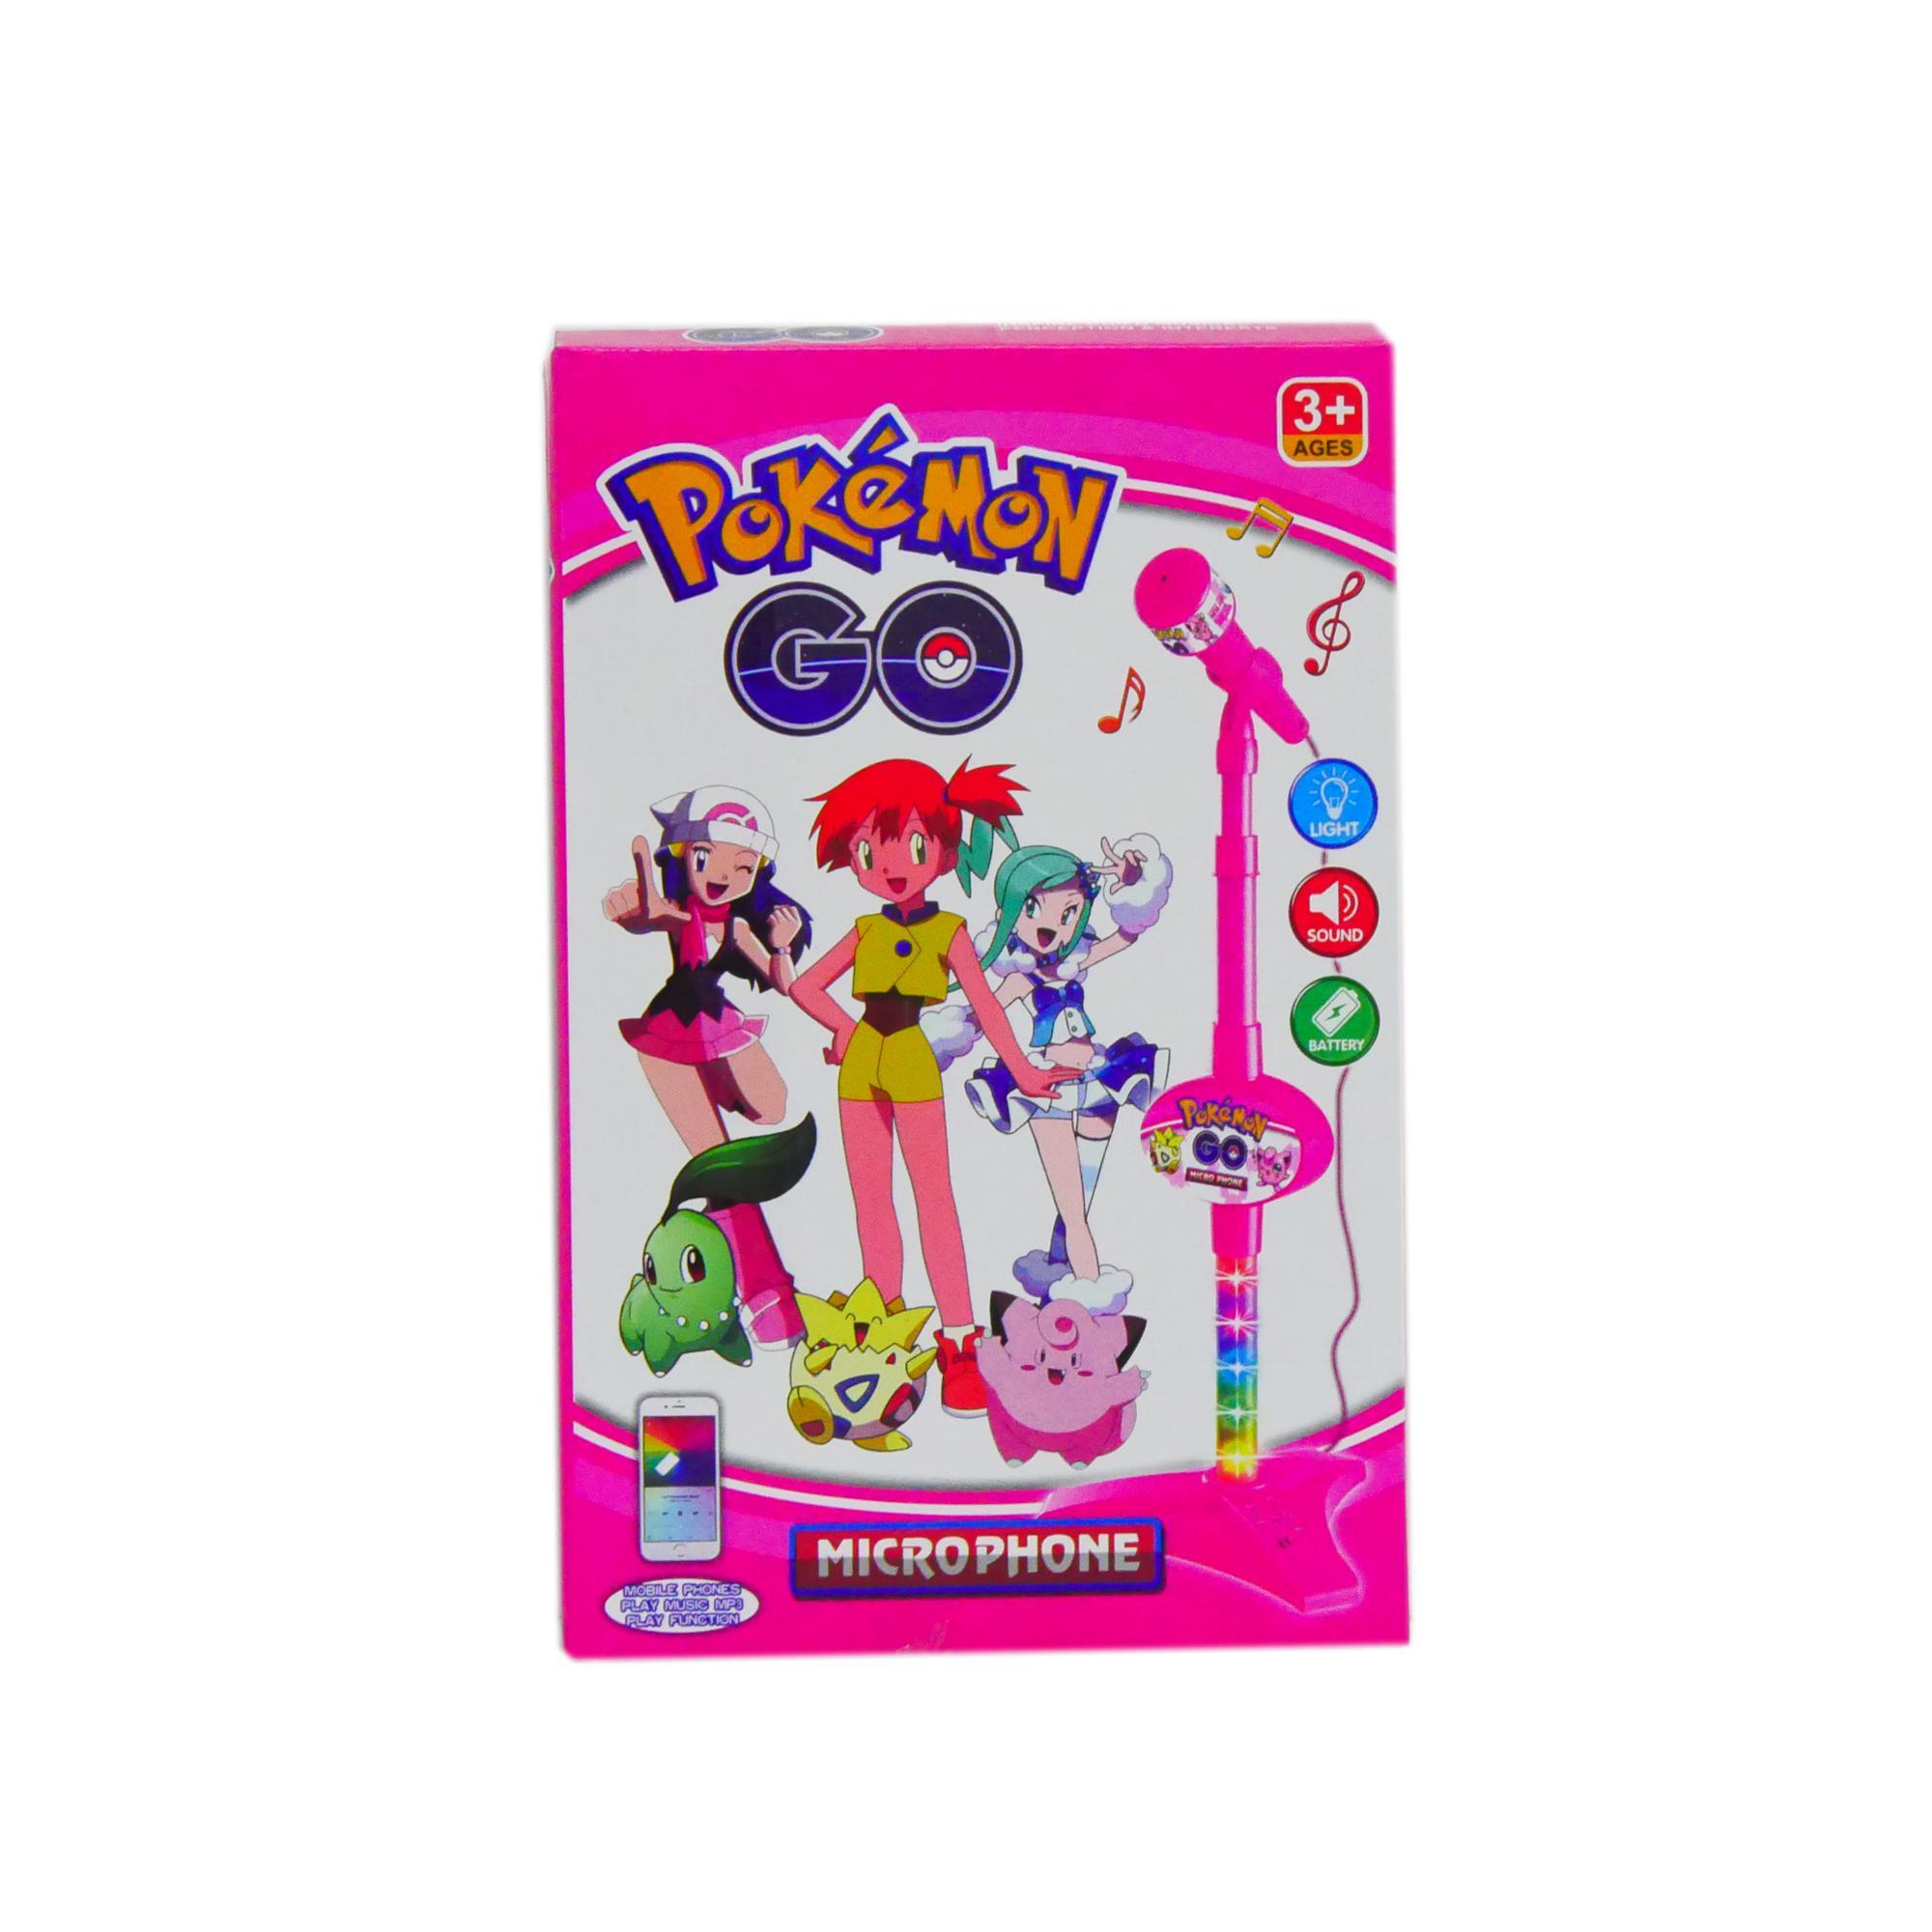 Toy Karaoke For Sale Kids Karaoke Online Brands Prices Reviews